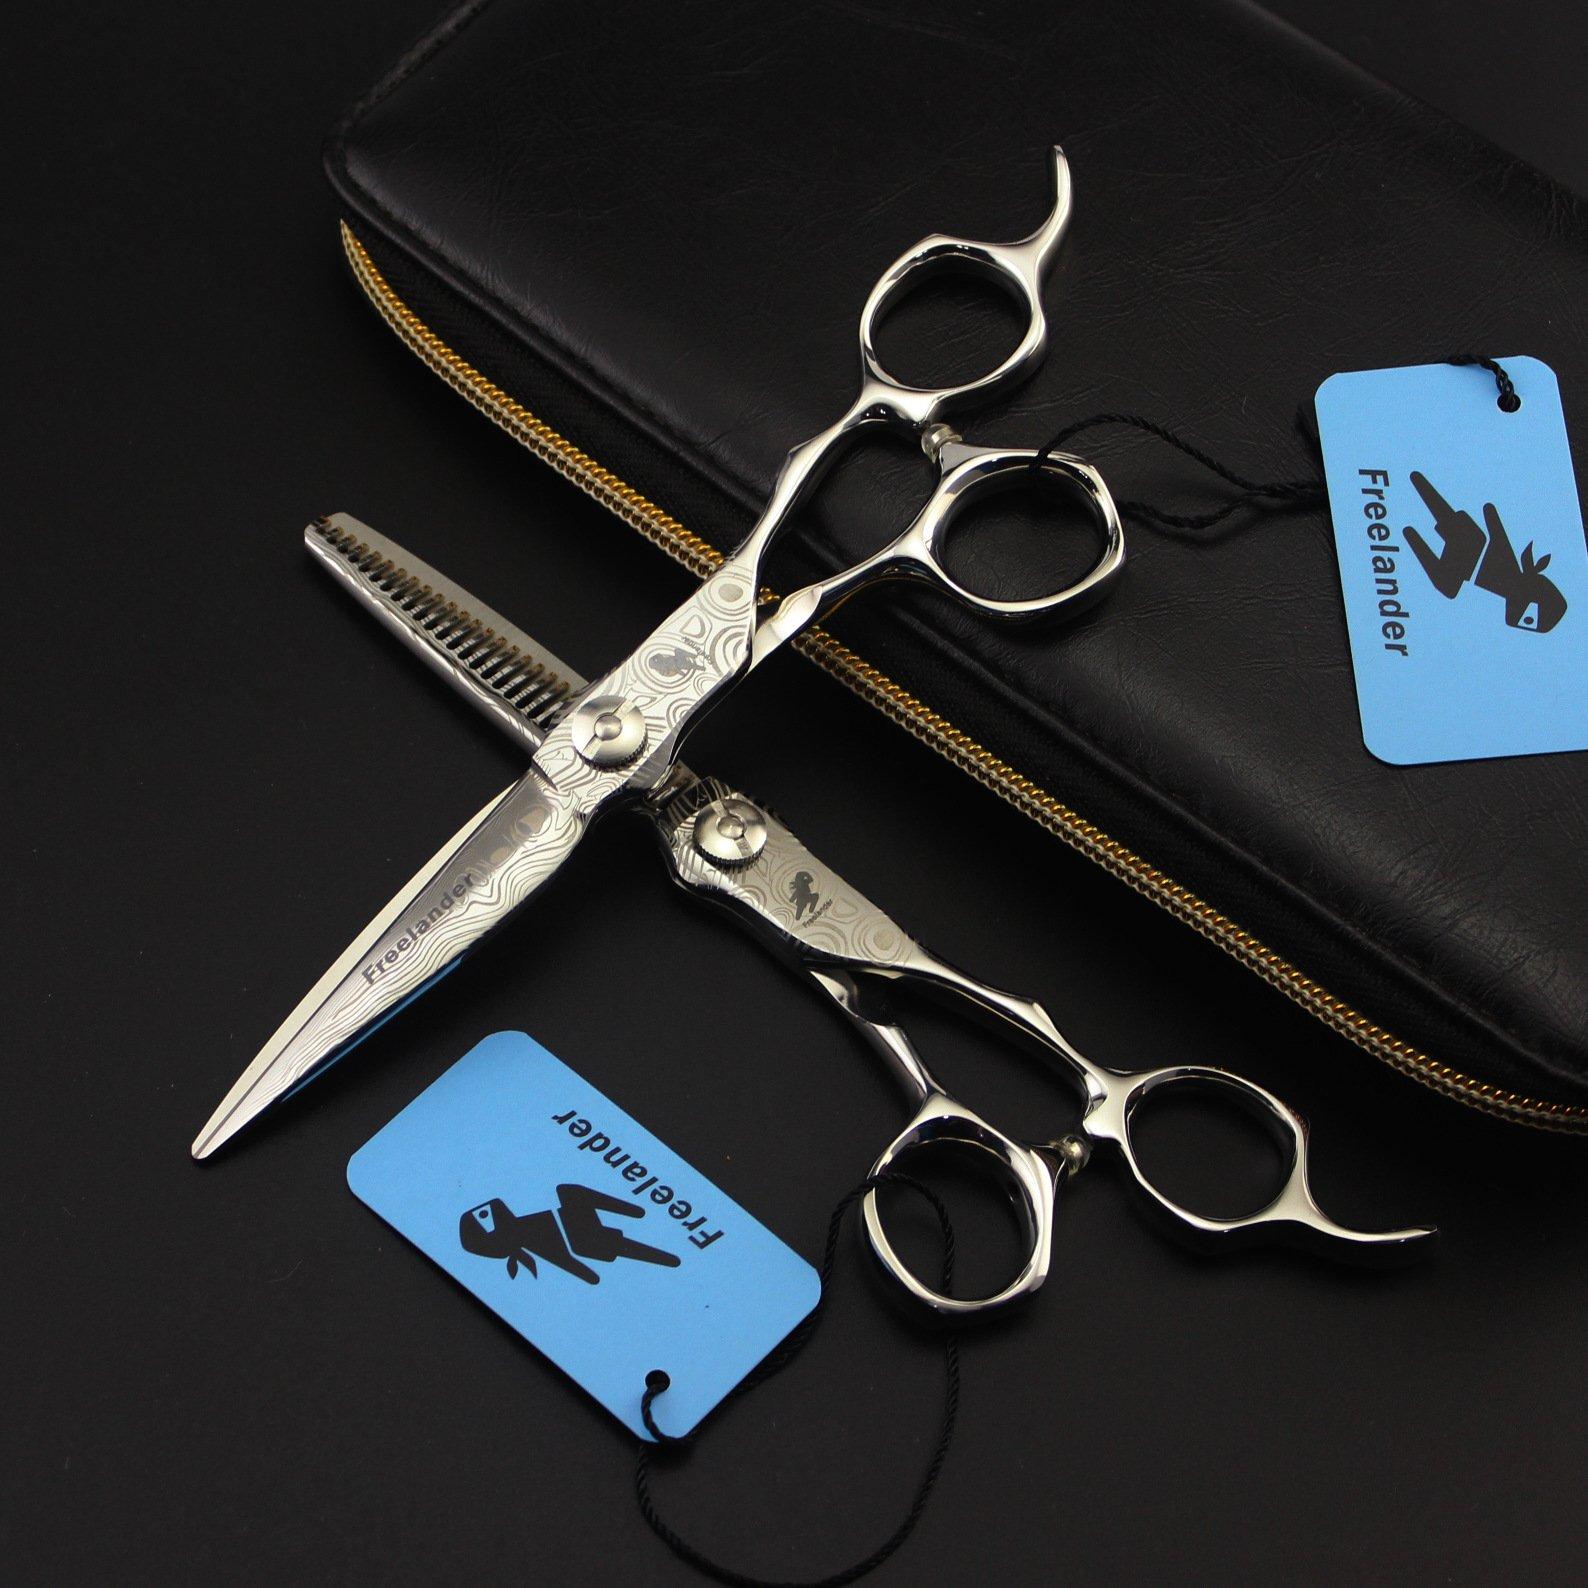 Professional Right Hand Hair Cutting Scissors Set,Barber Hair Shears Razor Edge Hairdressing Tools,Hair Cutting/Thinning Scissors Japanese Damascus Steel